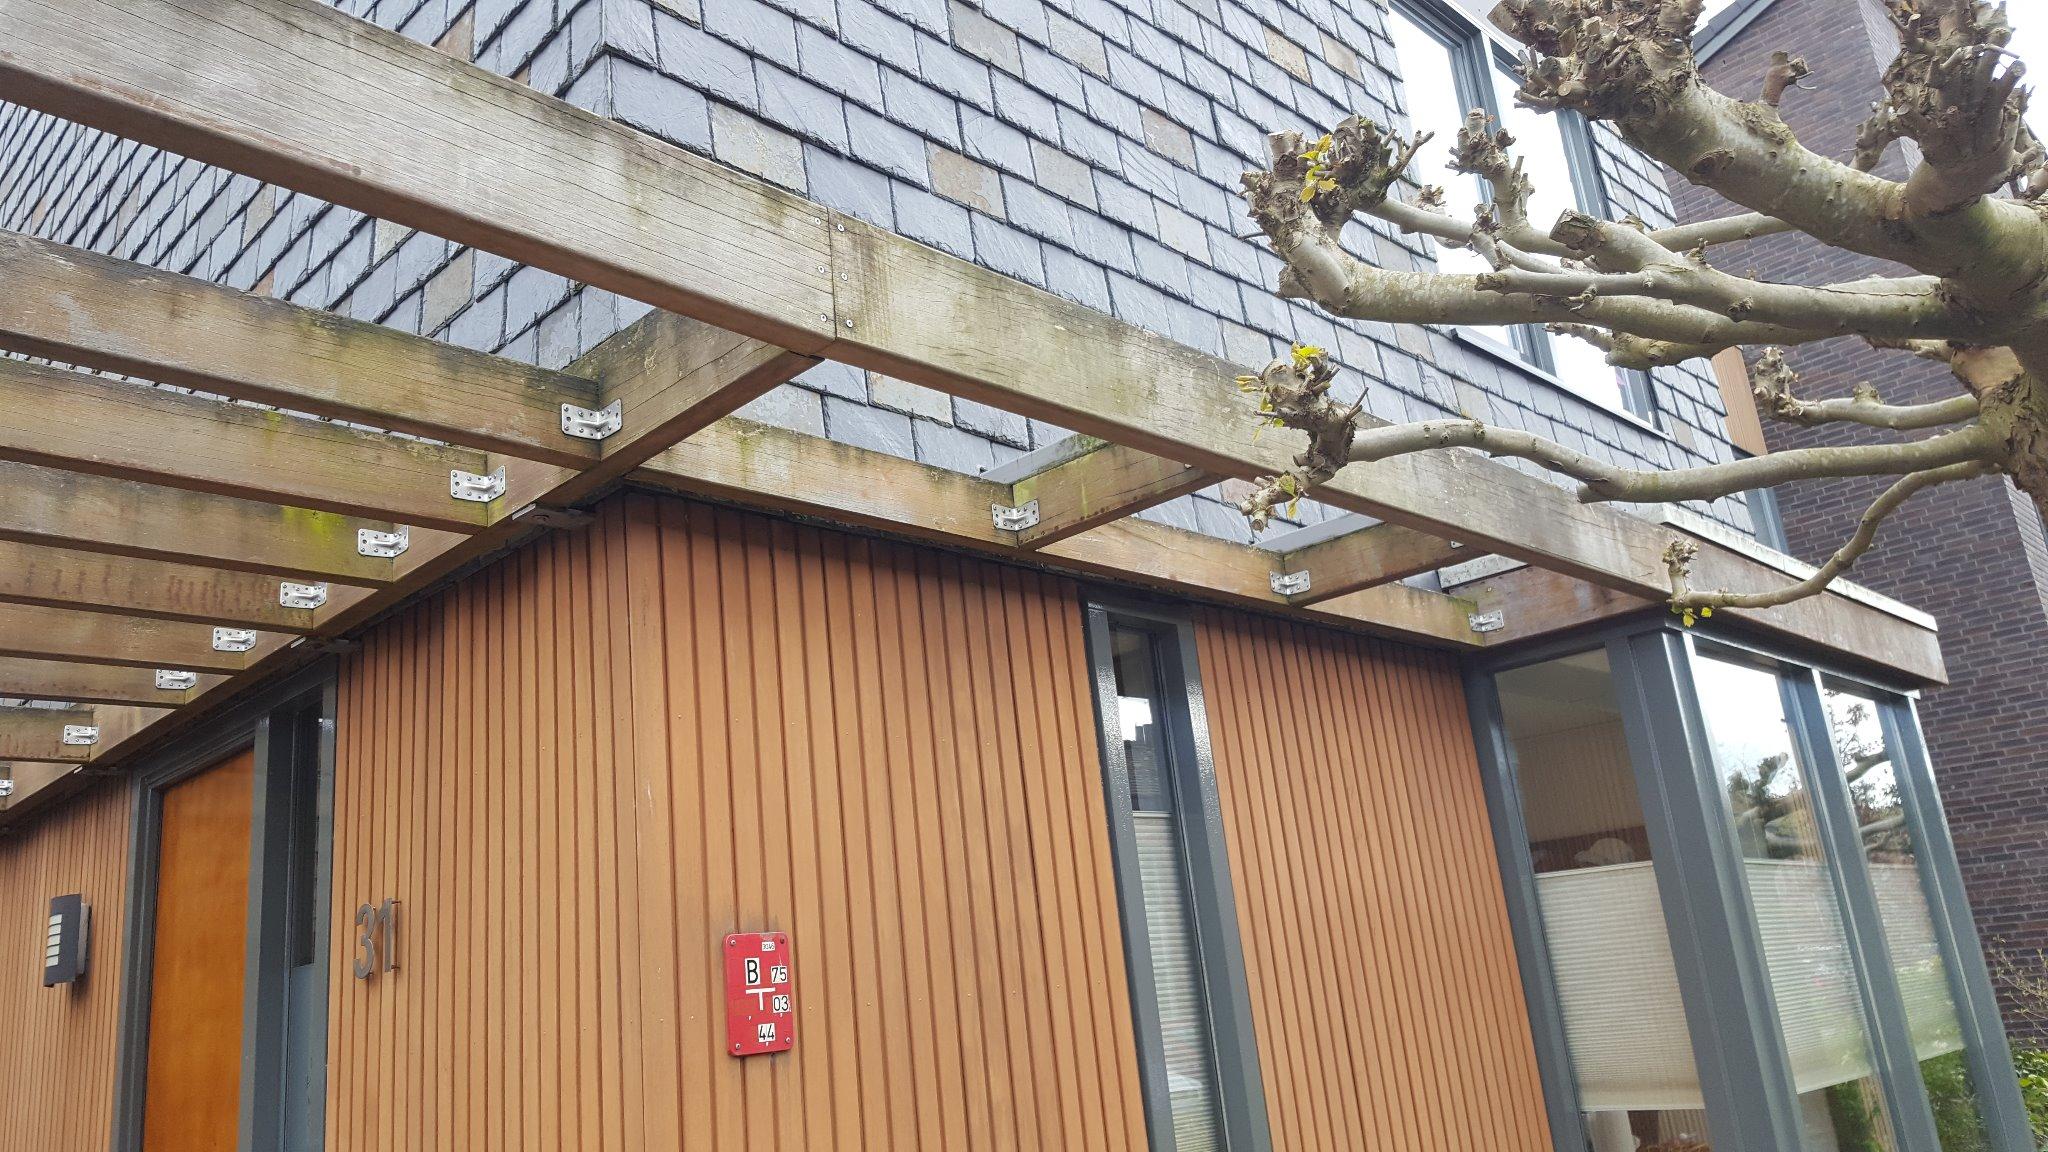 Carport maken dichtmaken 27m2 werkspot for Trapgat maken in beton